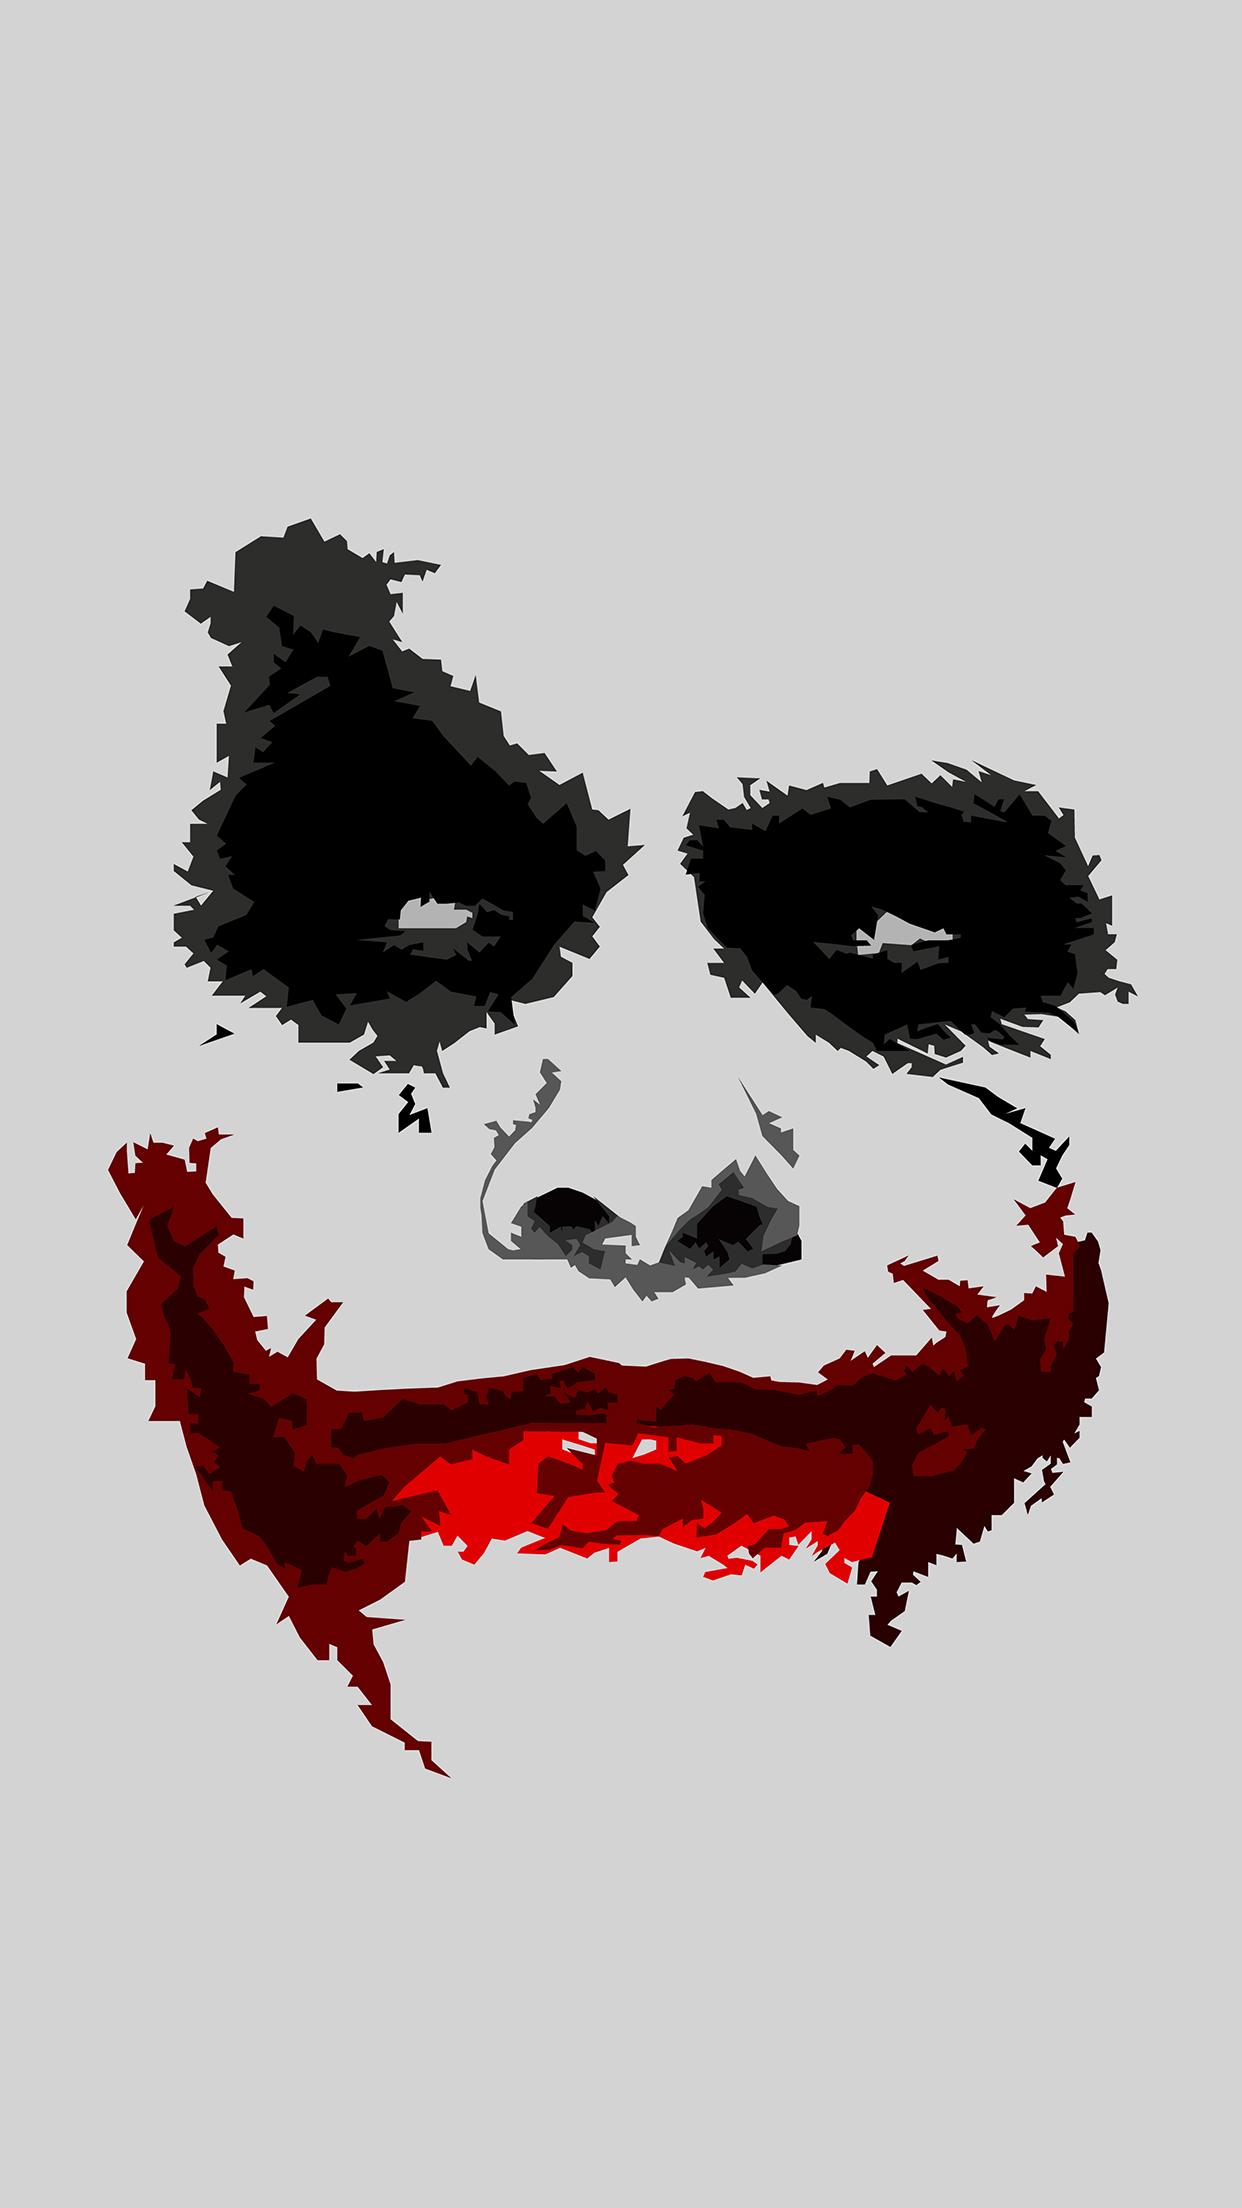 wallpaper hd iphone joker face free download